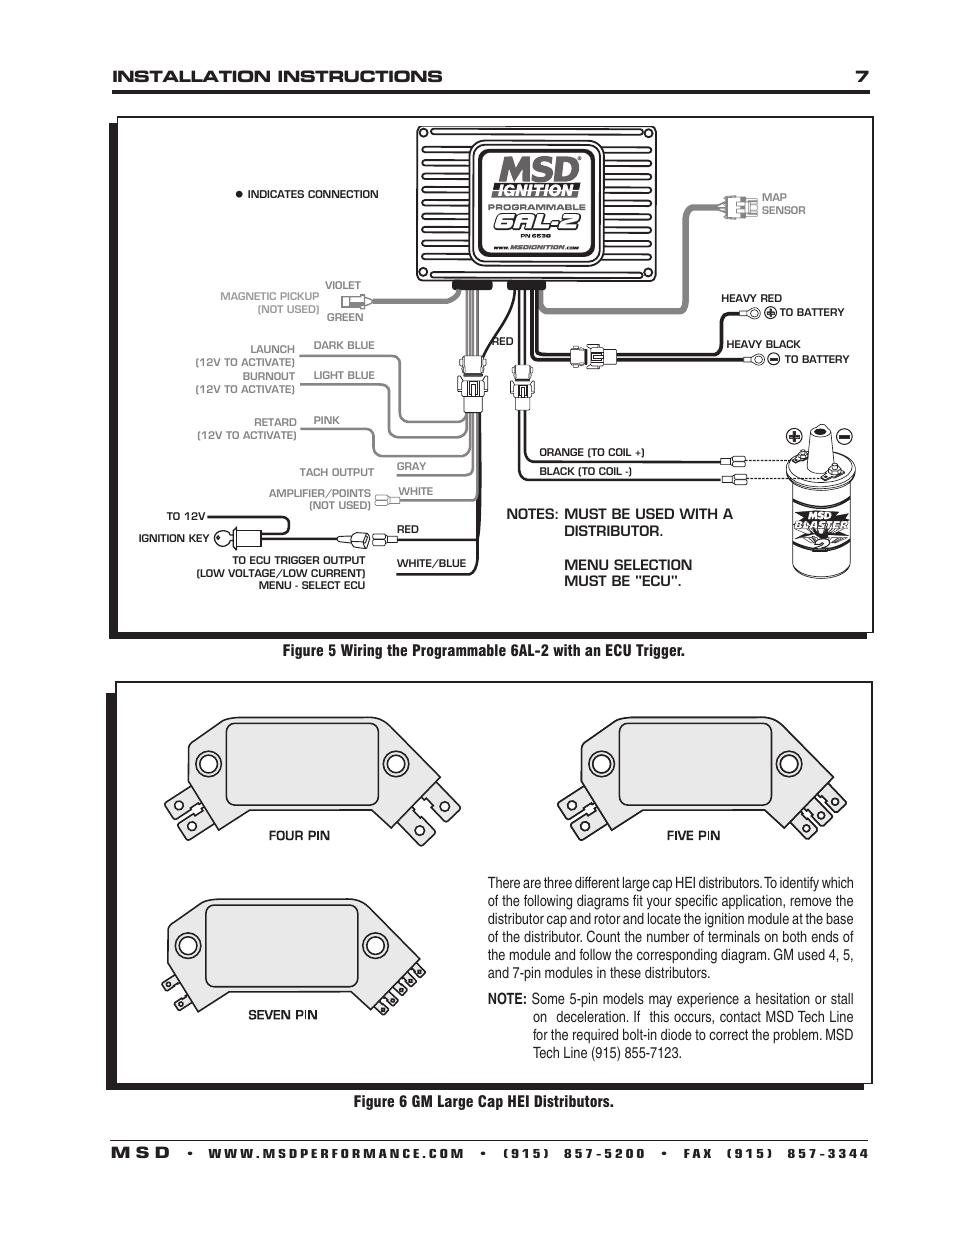 Msd 6al Box Wiring Diagram | Wiring Diagram Msd Al To Hei Pin Wiring Diagram on msd 6al box wiring diagram, msd 6al 2 wiring diagram, msd 6al tach wiring diagram, distributor hei wiring diagram,